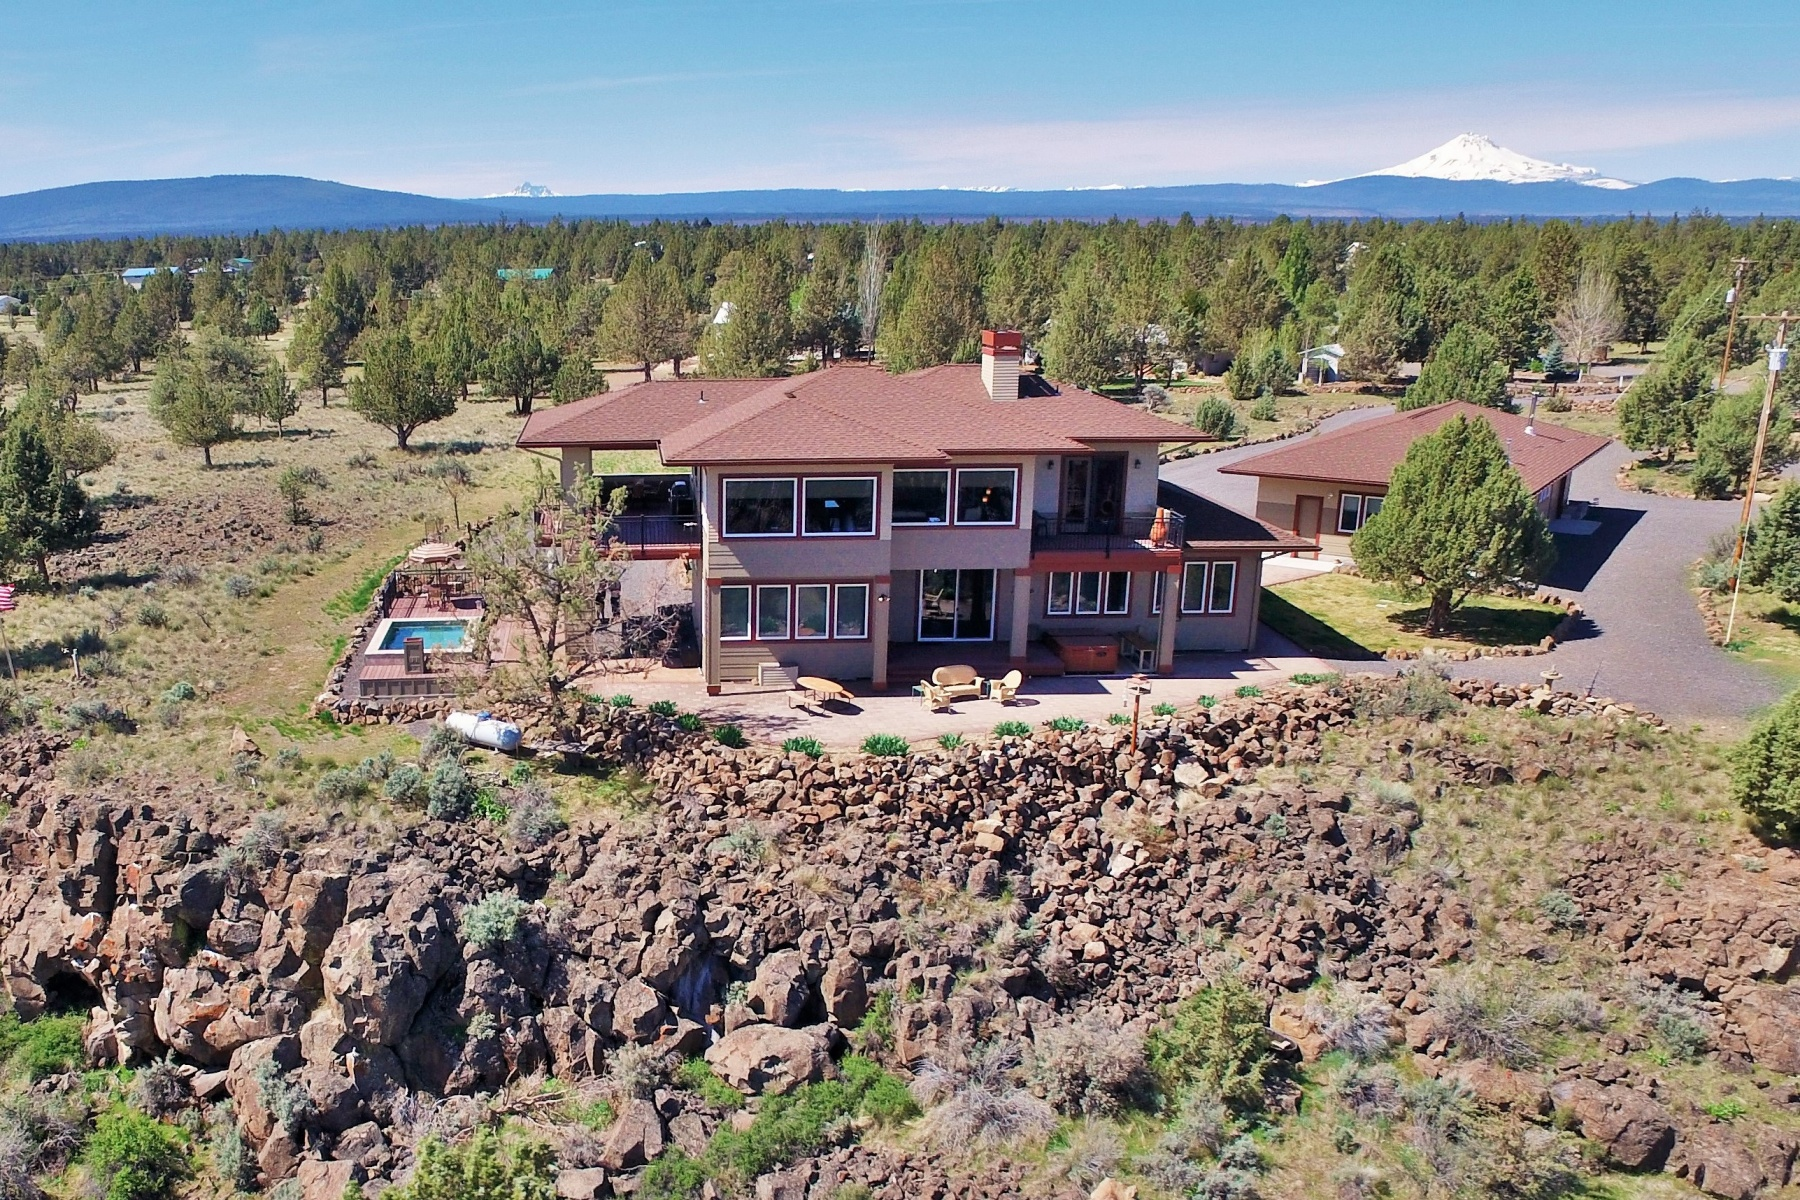 独户住宅 为 销售 在 Premiere Property For Sale 9791 SW Paiute Dr 卡尔弗, 俄勒冈州, 97734 美国